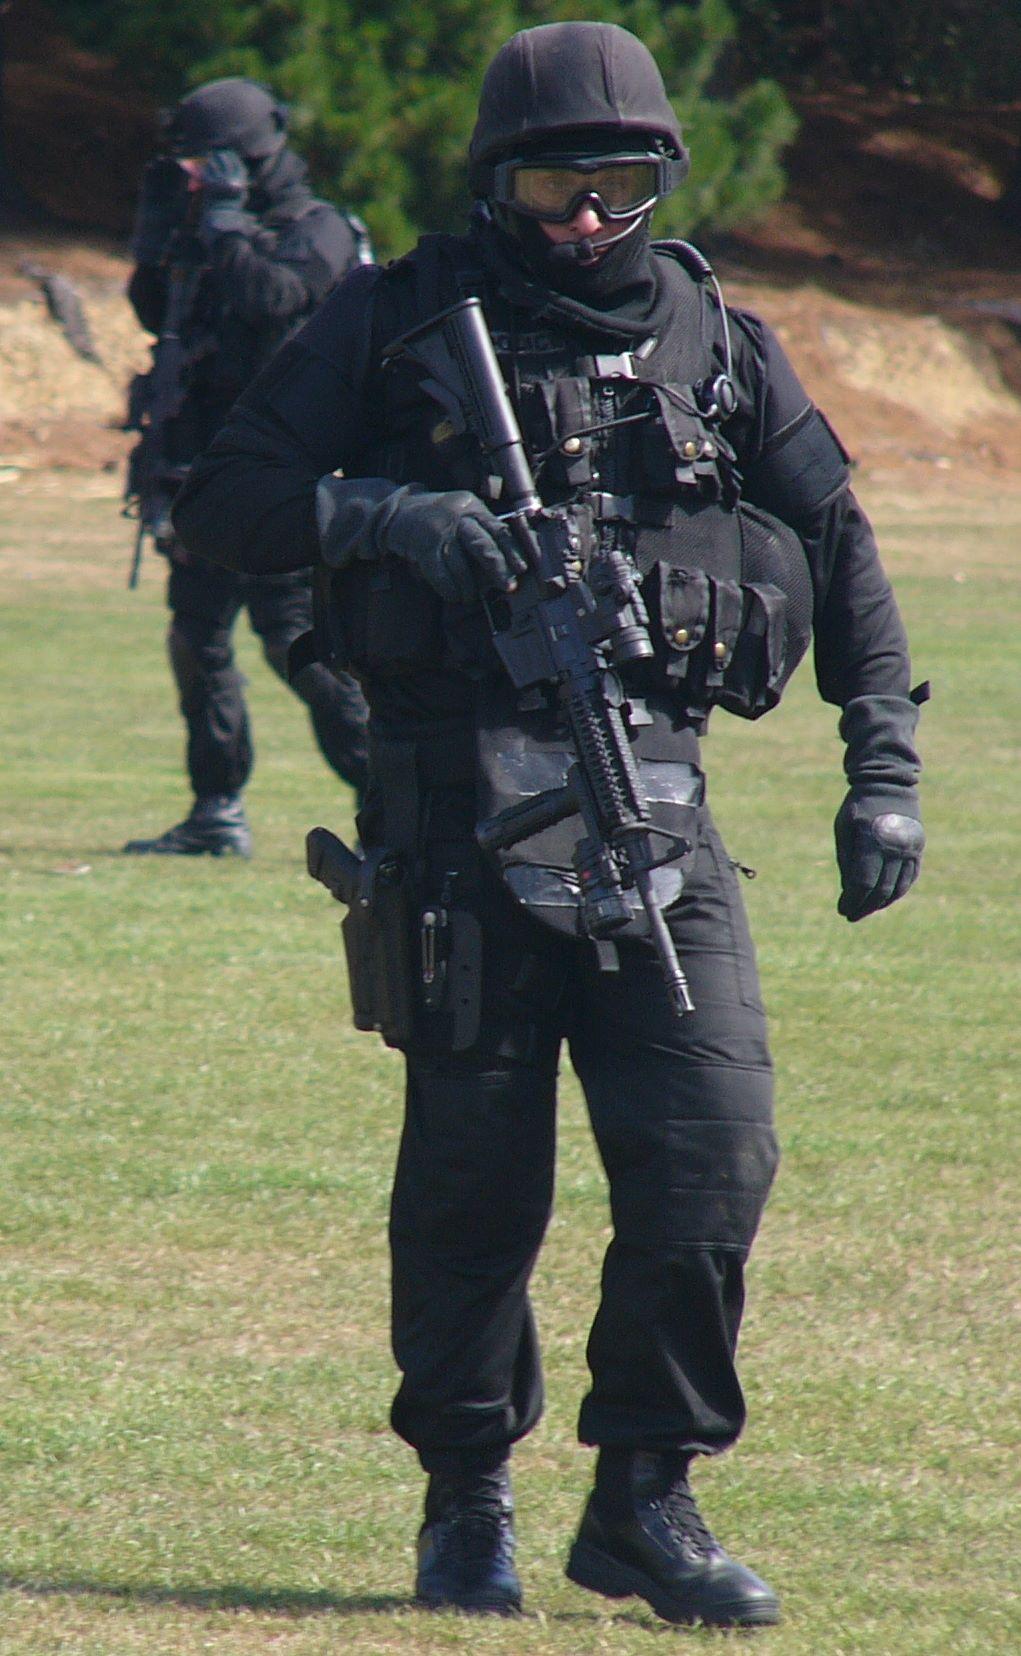 Original Swat Black Shoes